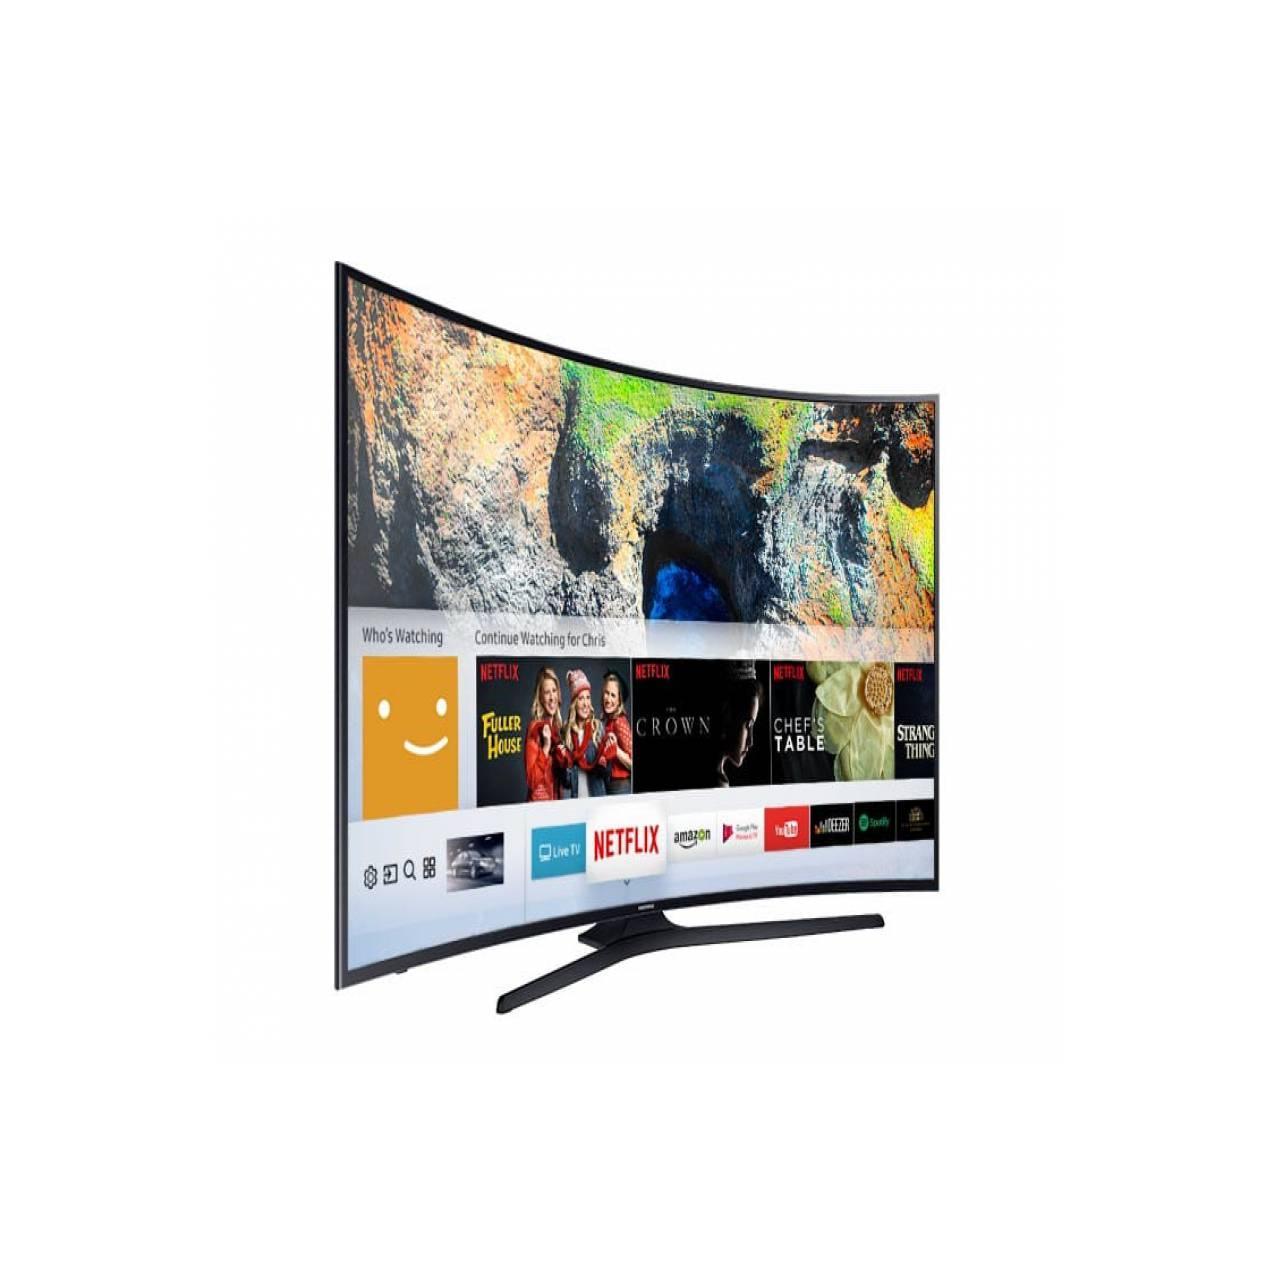 Samsung UA55MU6300 55 Inch UHD 4K Smart Curved LED TV